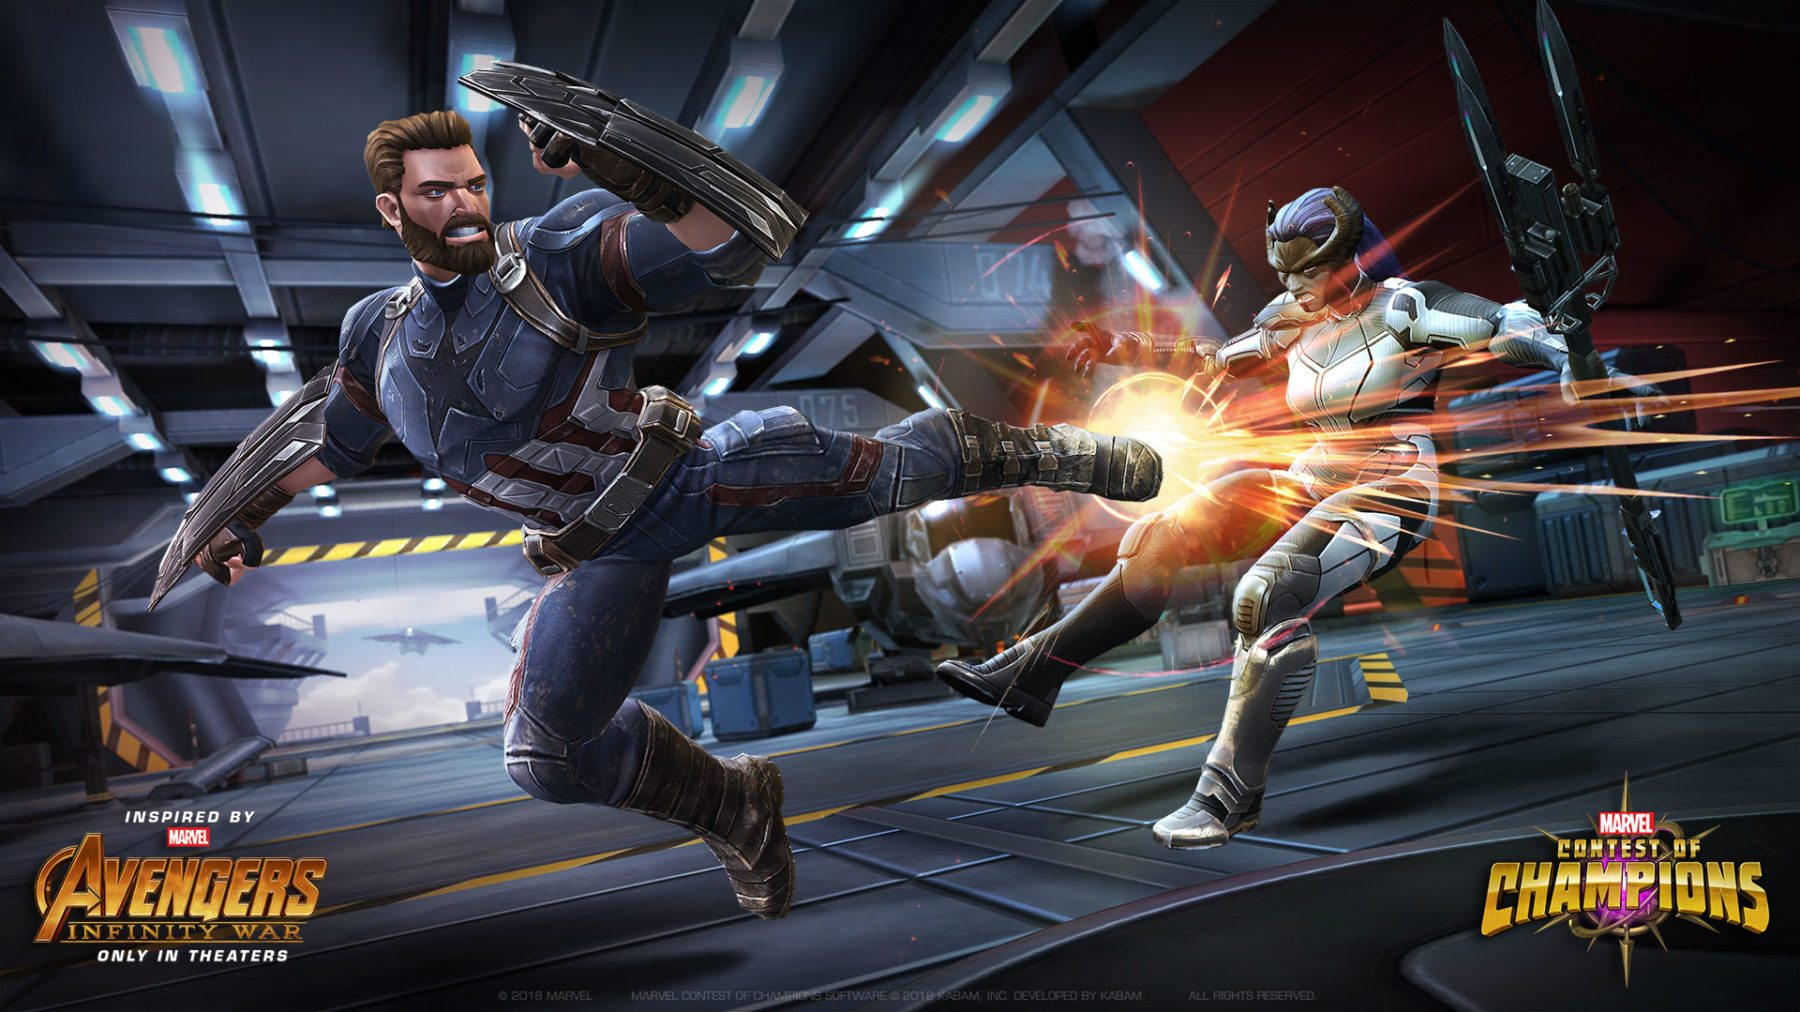 Avengers: Infinity War's Captain America se une a la pelea en Marvel Contest of Champions